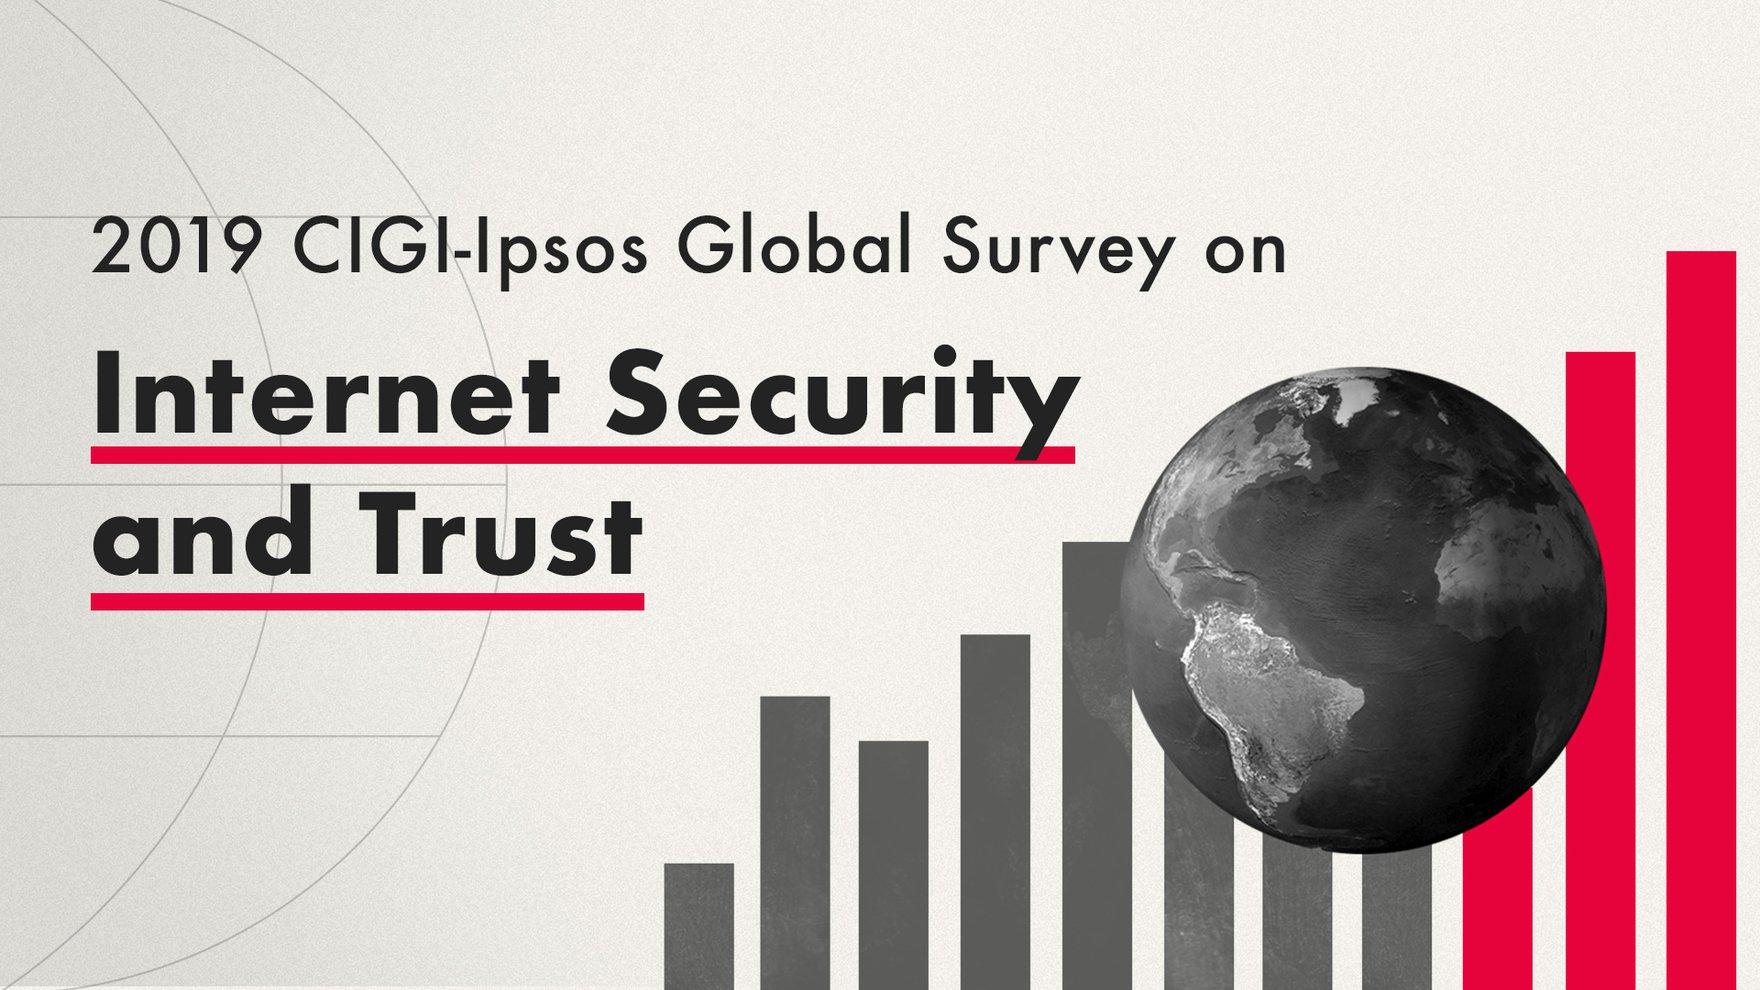 CIGI-Ipsos Global Survey 2019.jpg